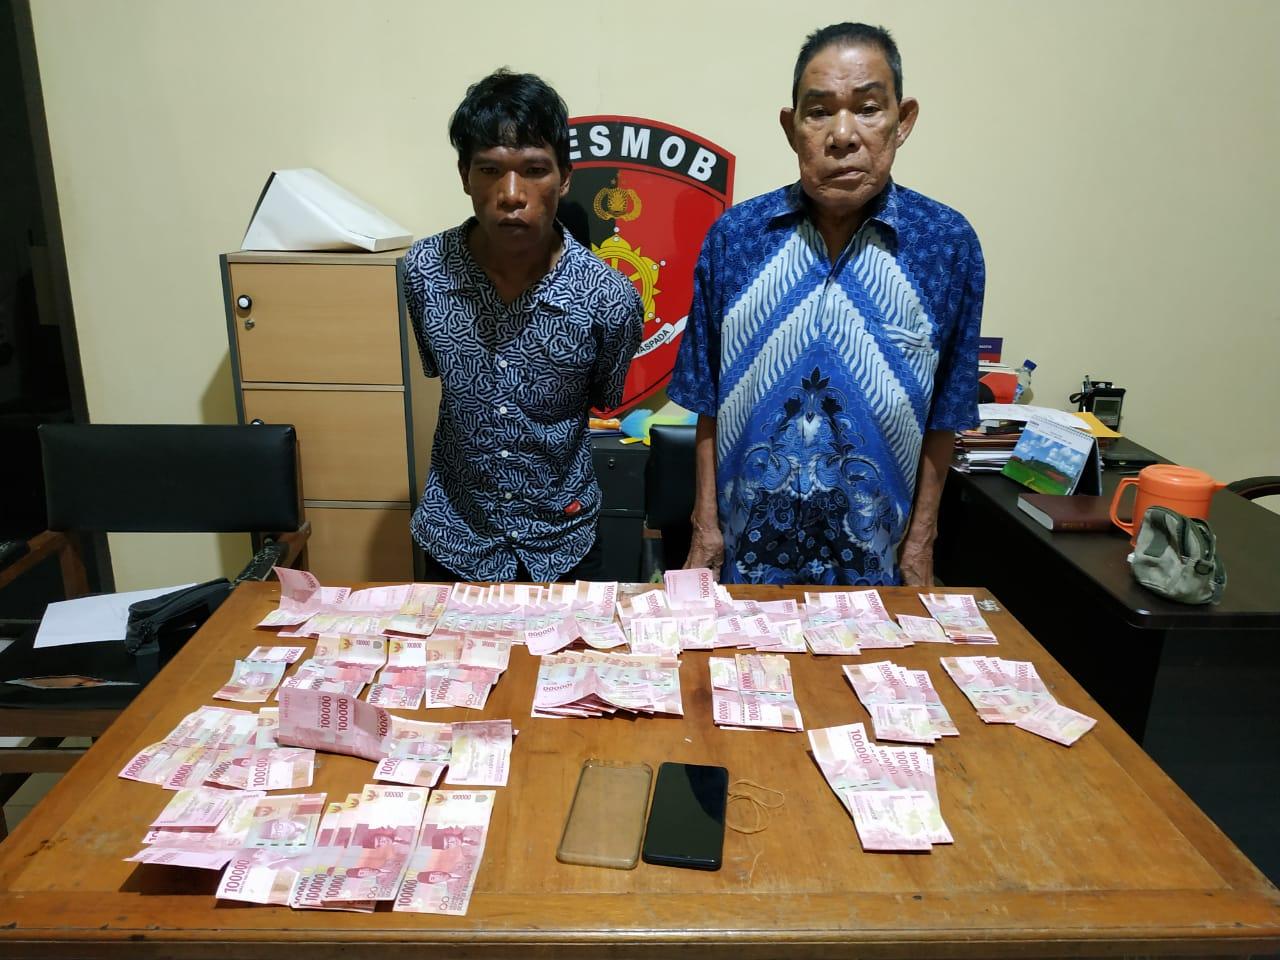 Pelaku pencurian di Luwuk, yang berhasil di tangkap Polda Gorontalo